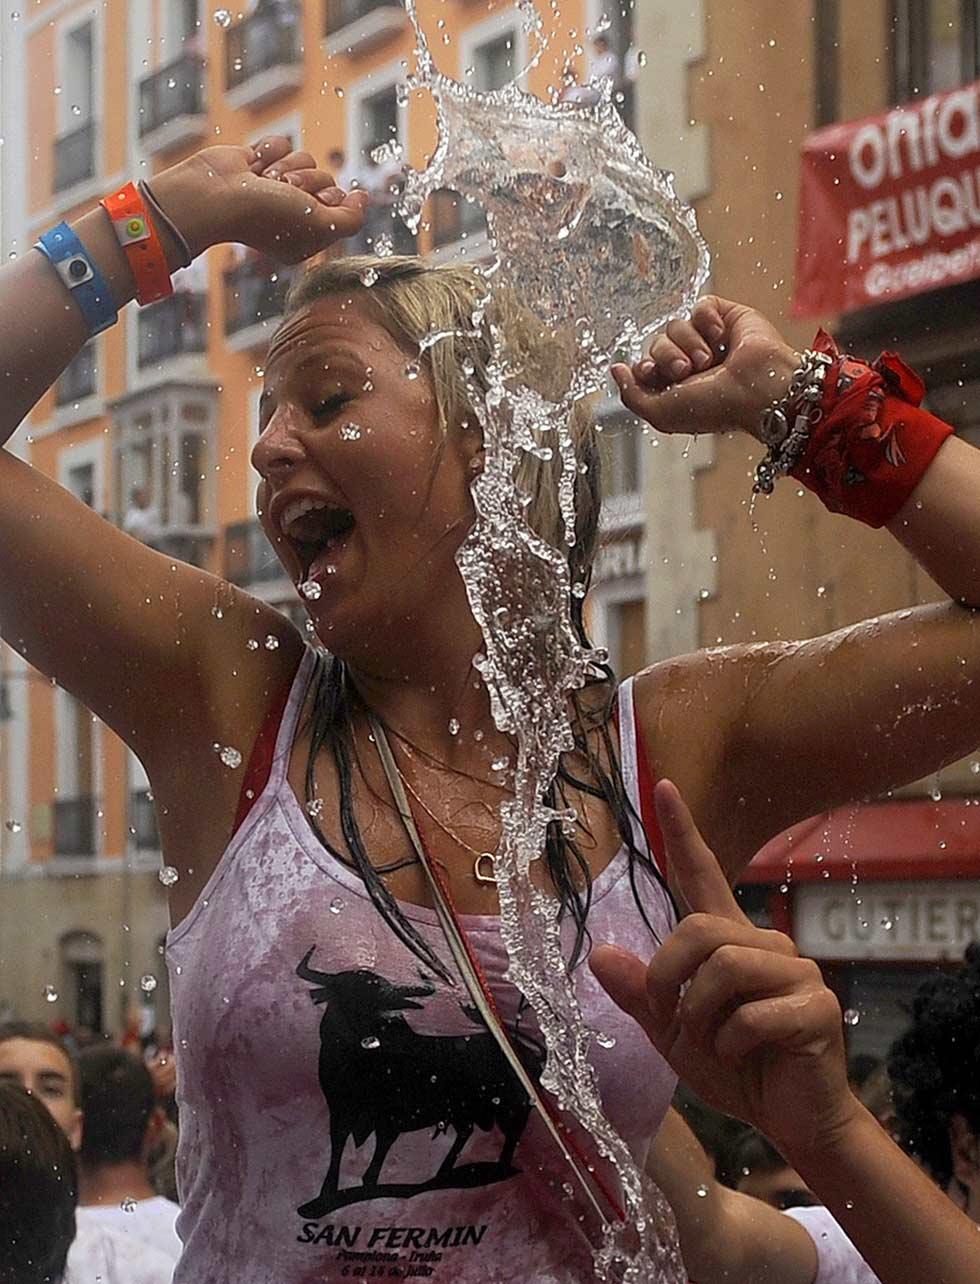 PEDRO ARMESTRE (AFP)